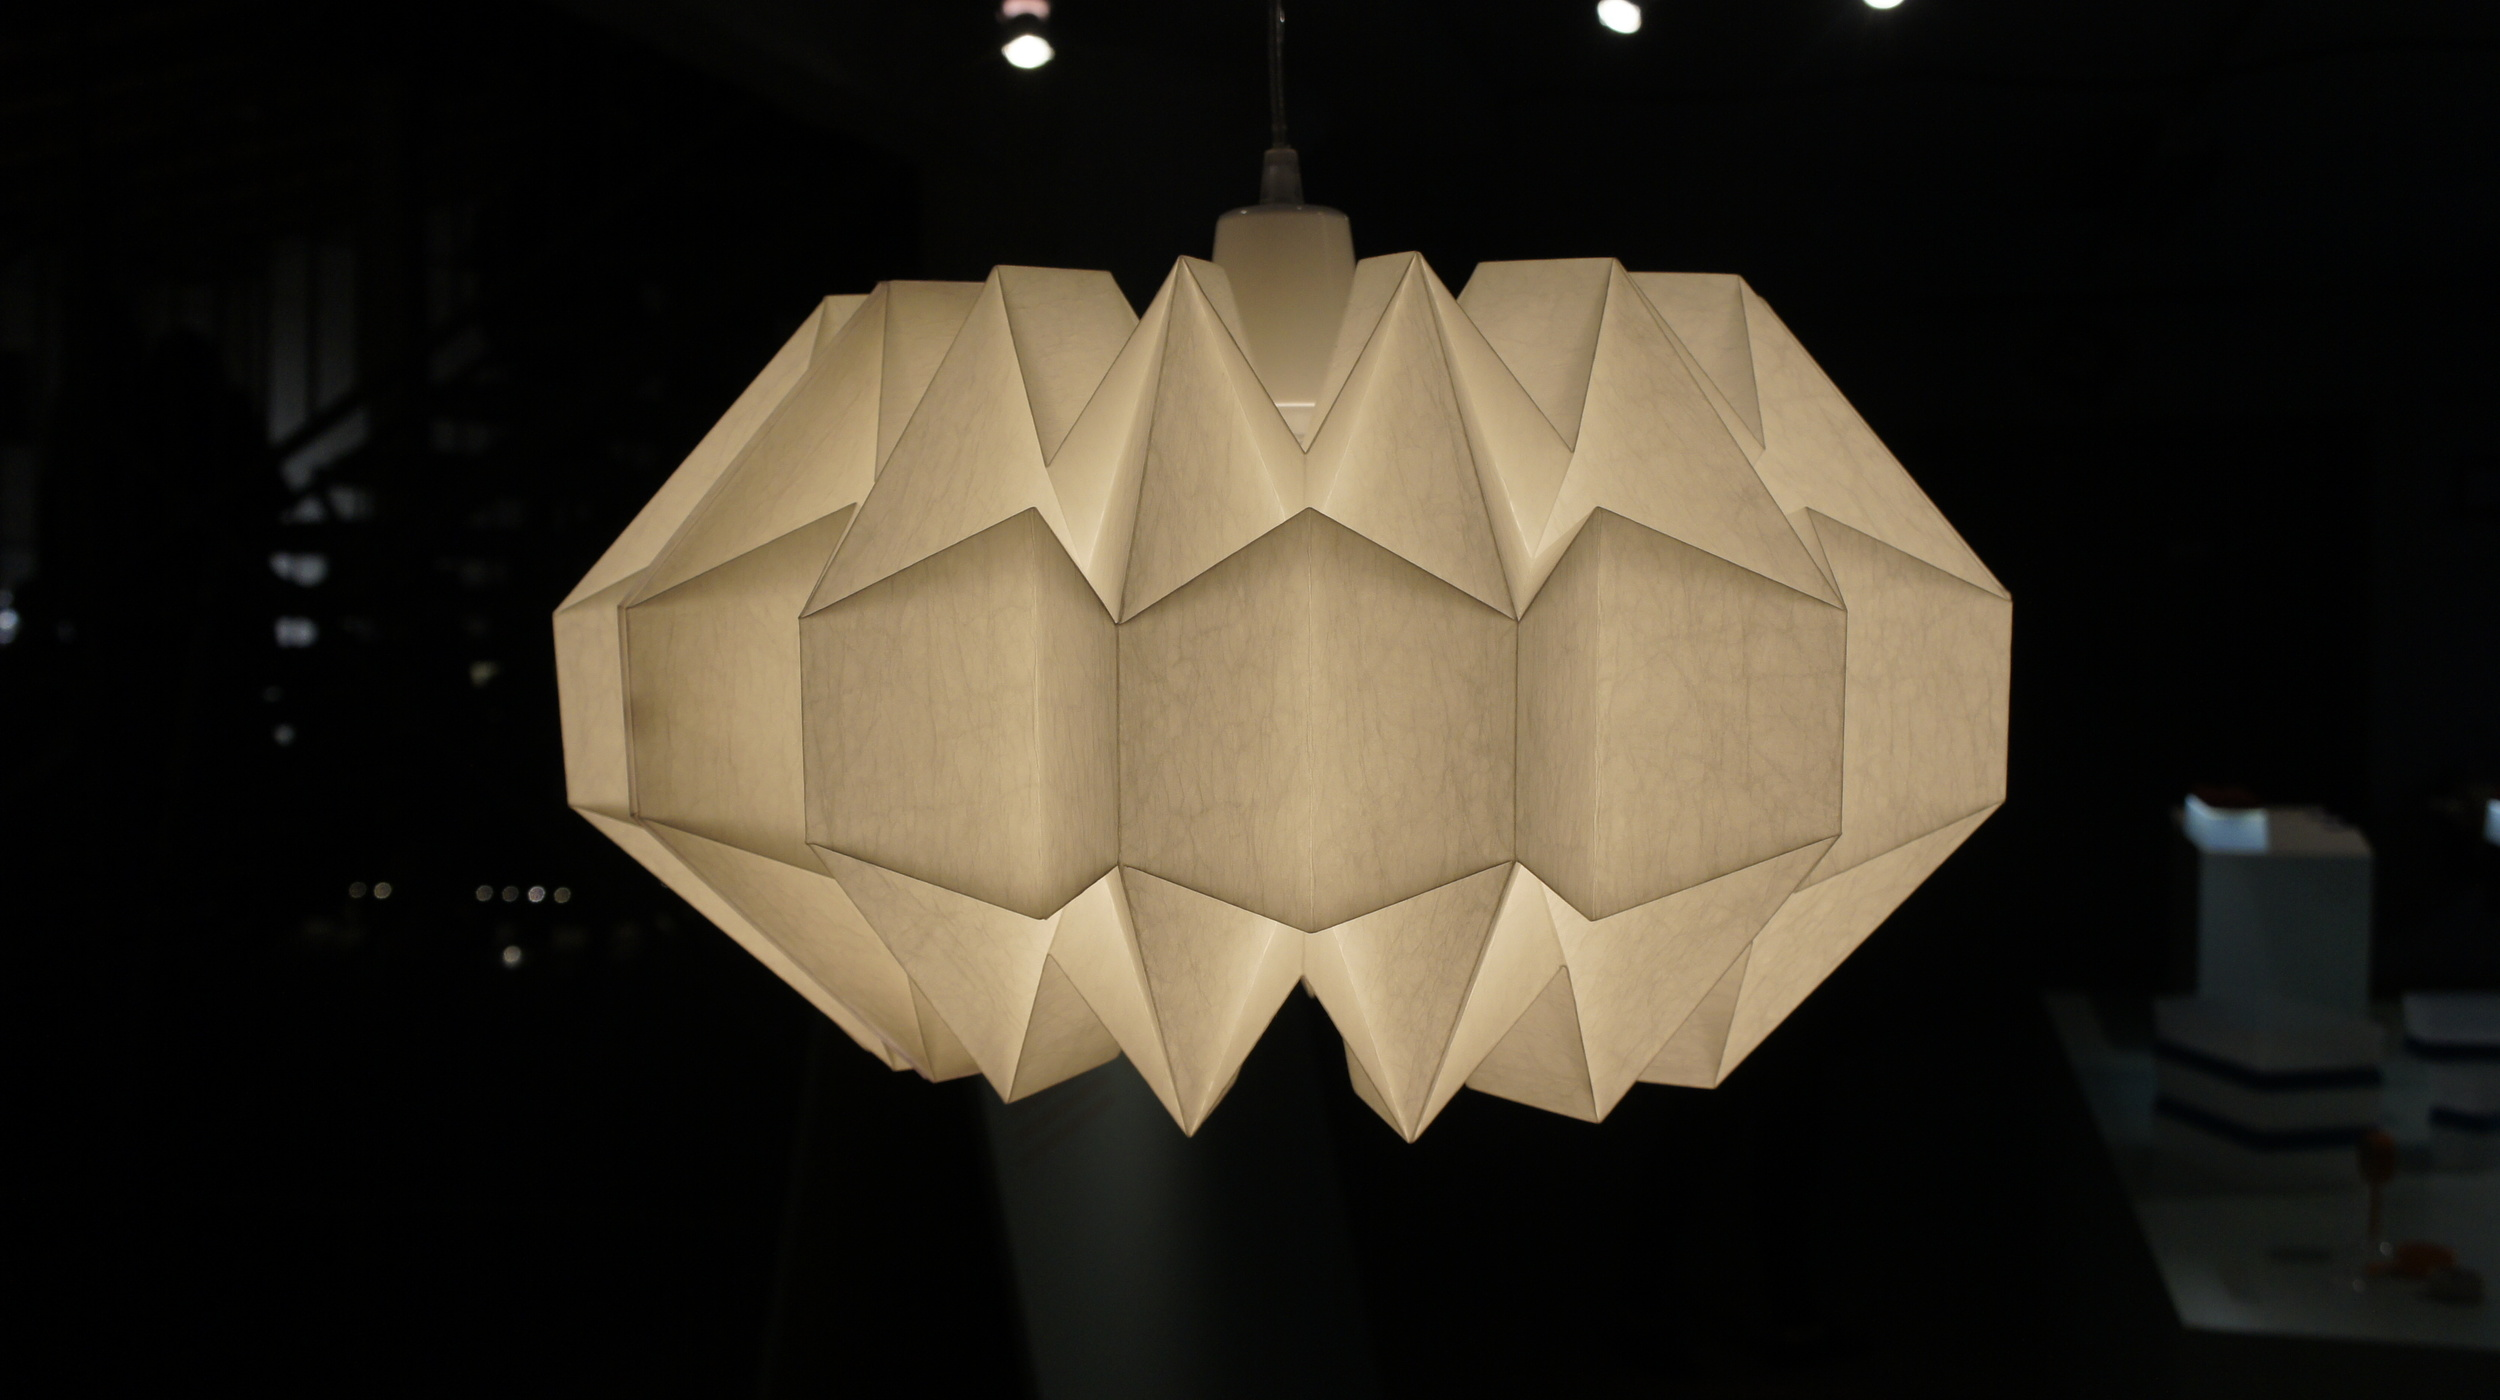 Origami inspired shade